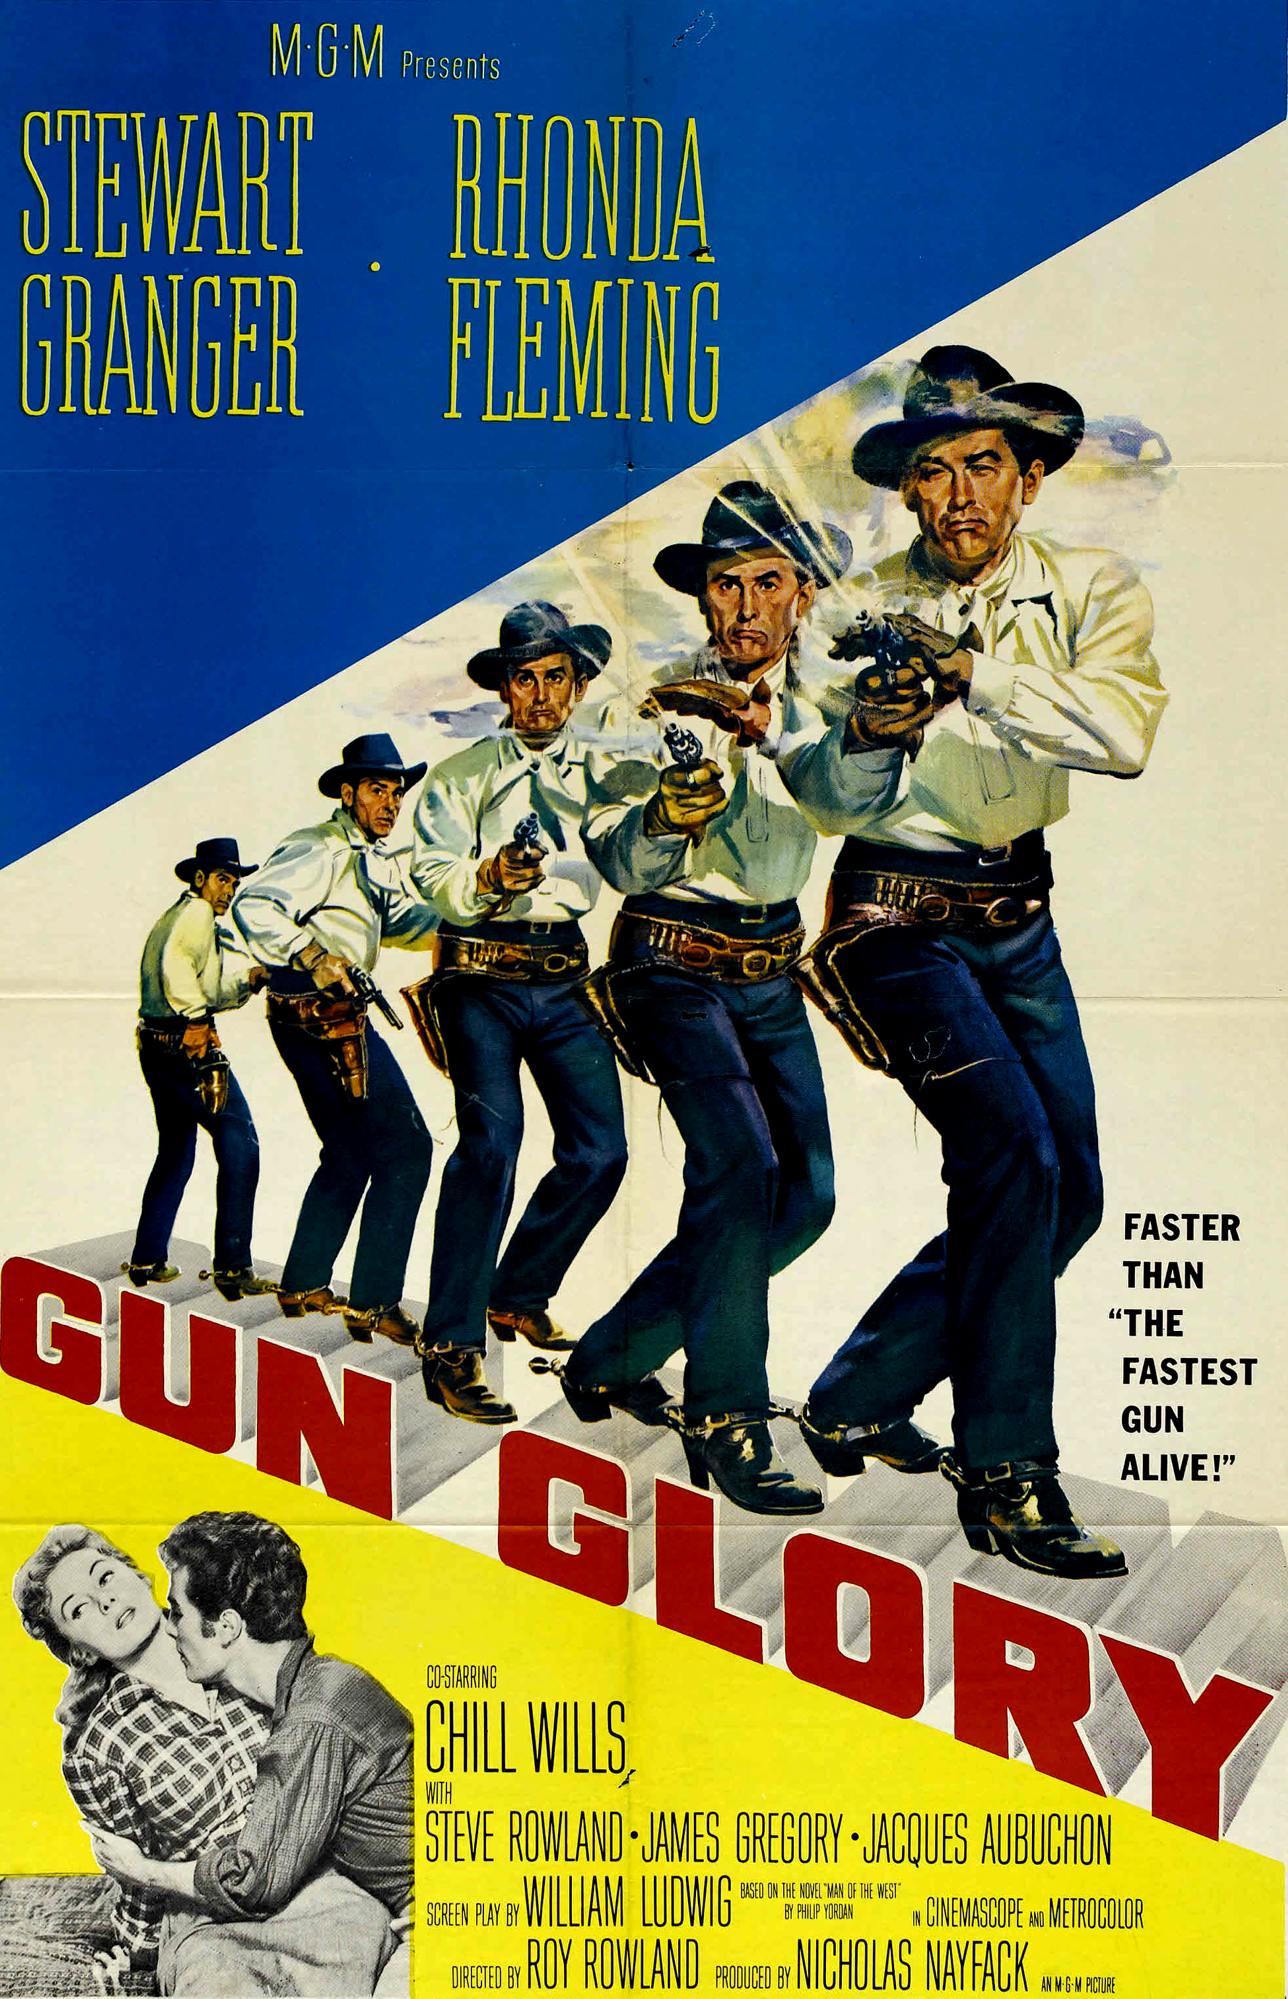 Stewart Granger, Rhonda Fleming, and Steve Rowland in Gun Glory (1957)